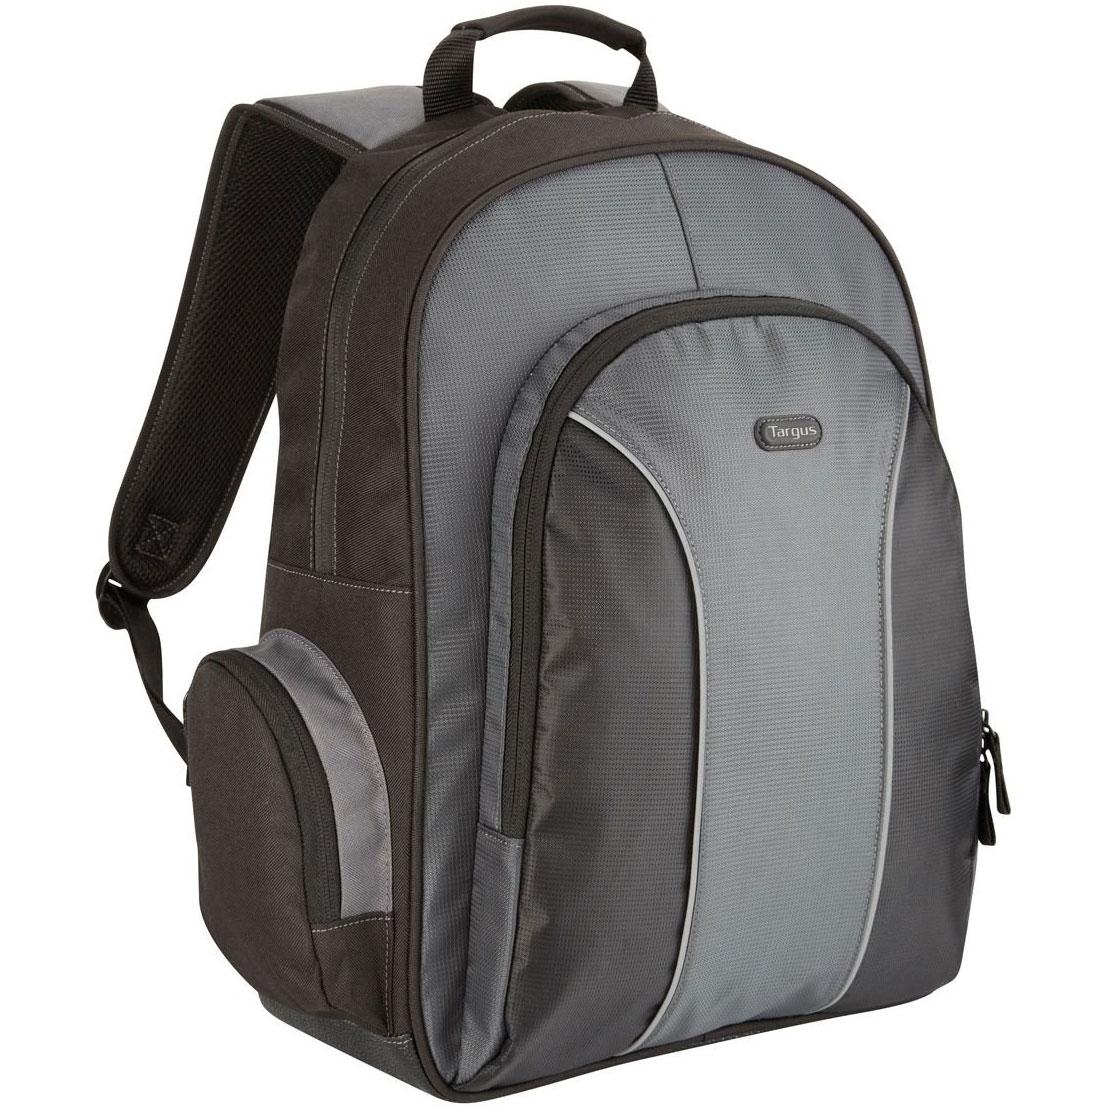 targus essential backpack 15 4 16 noir gris sac sacoche housse targus sur. Black Bedroom Furniture Sets. Home Design Ideas